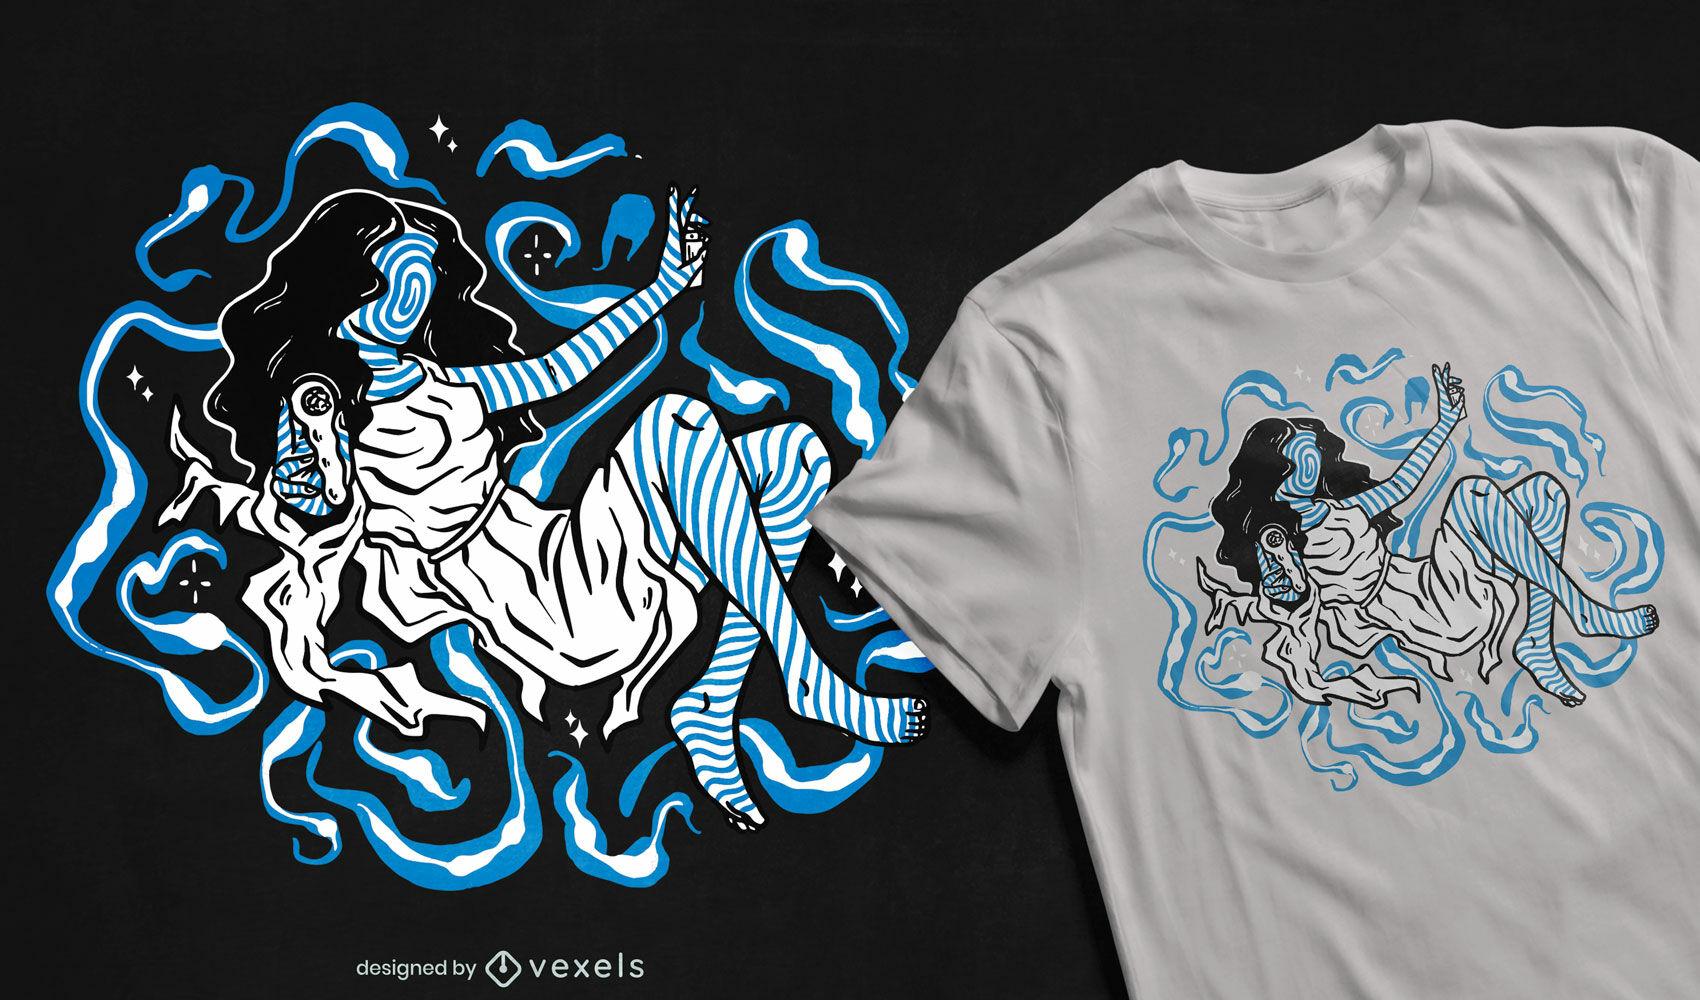 Diseño de camiseta psicodélica mujer trippy azul